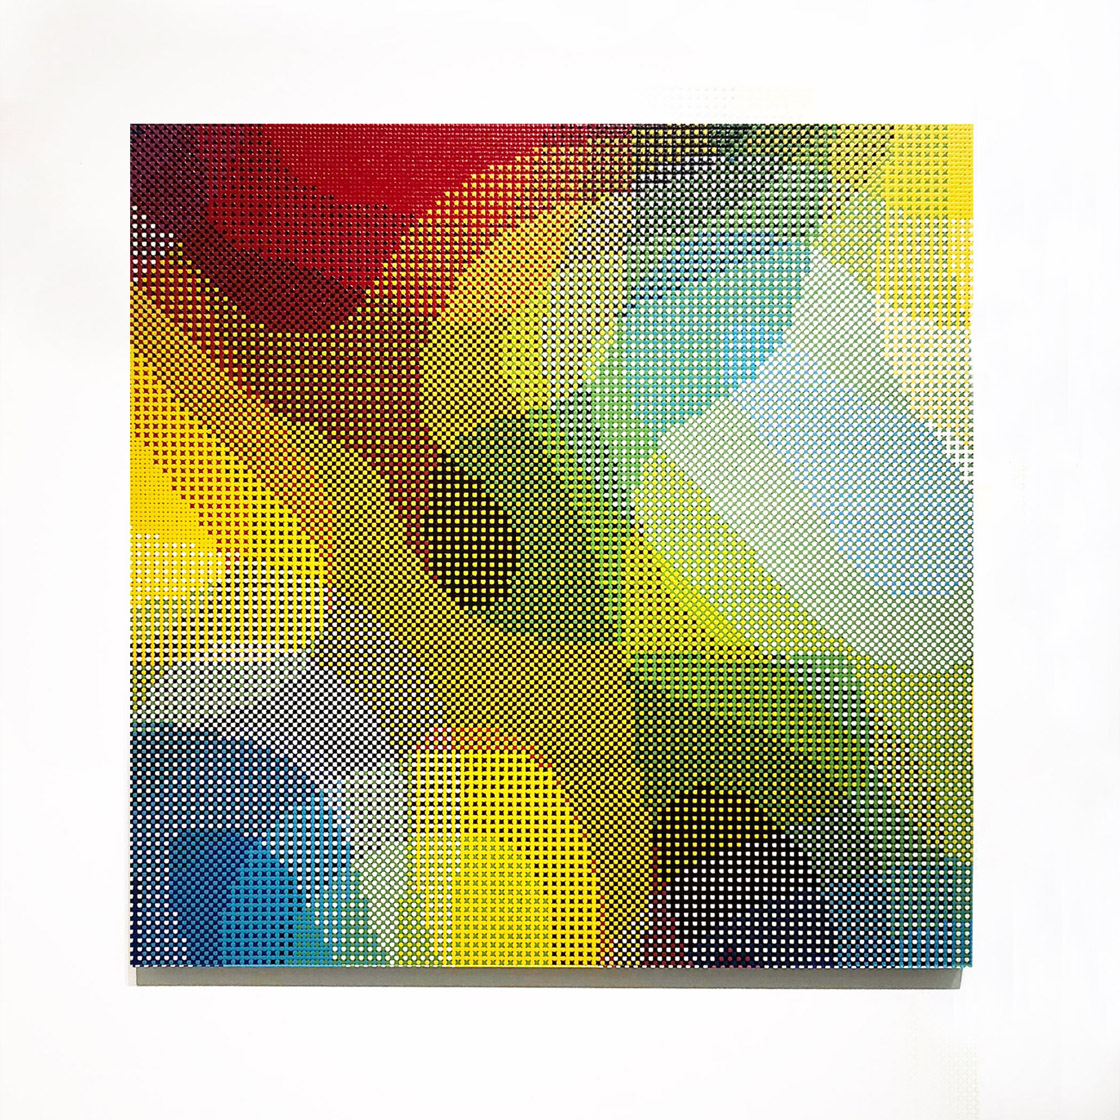 William Betts, Tango, Color Space XVIII, 36x36, 2017